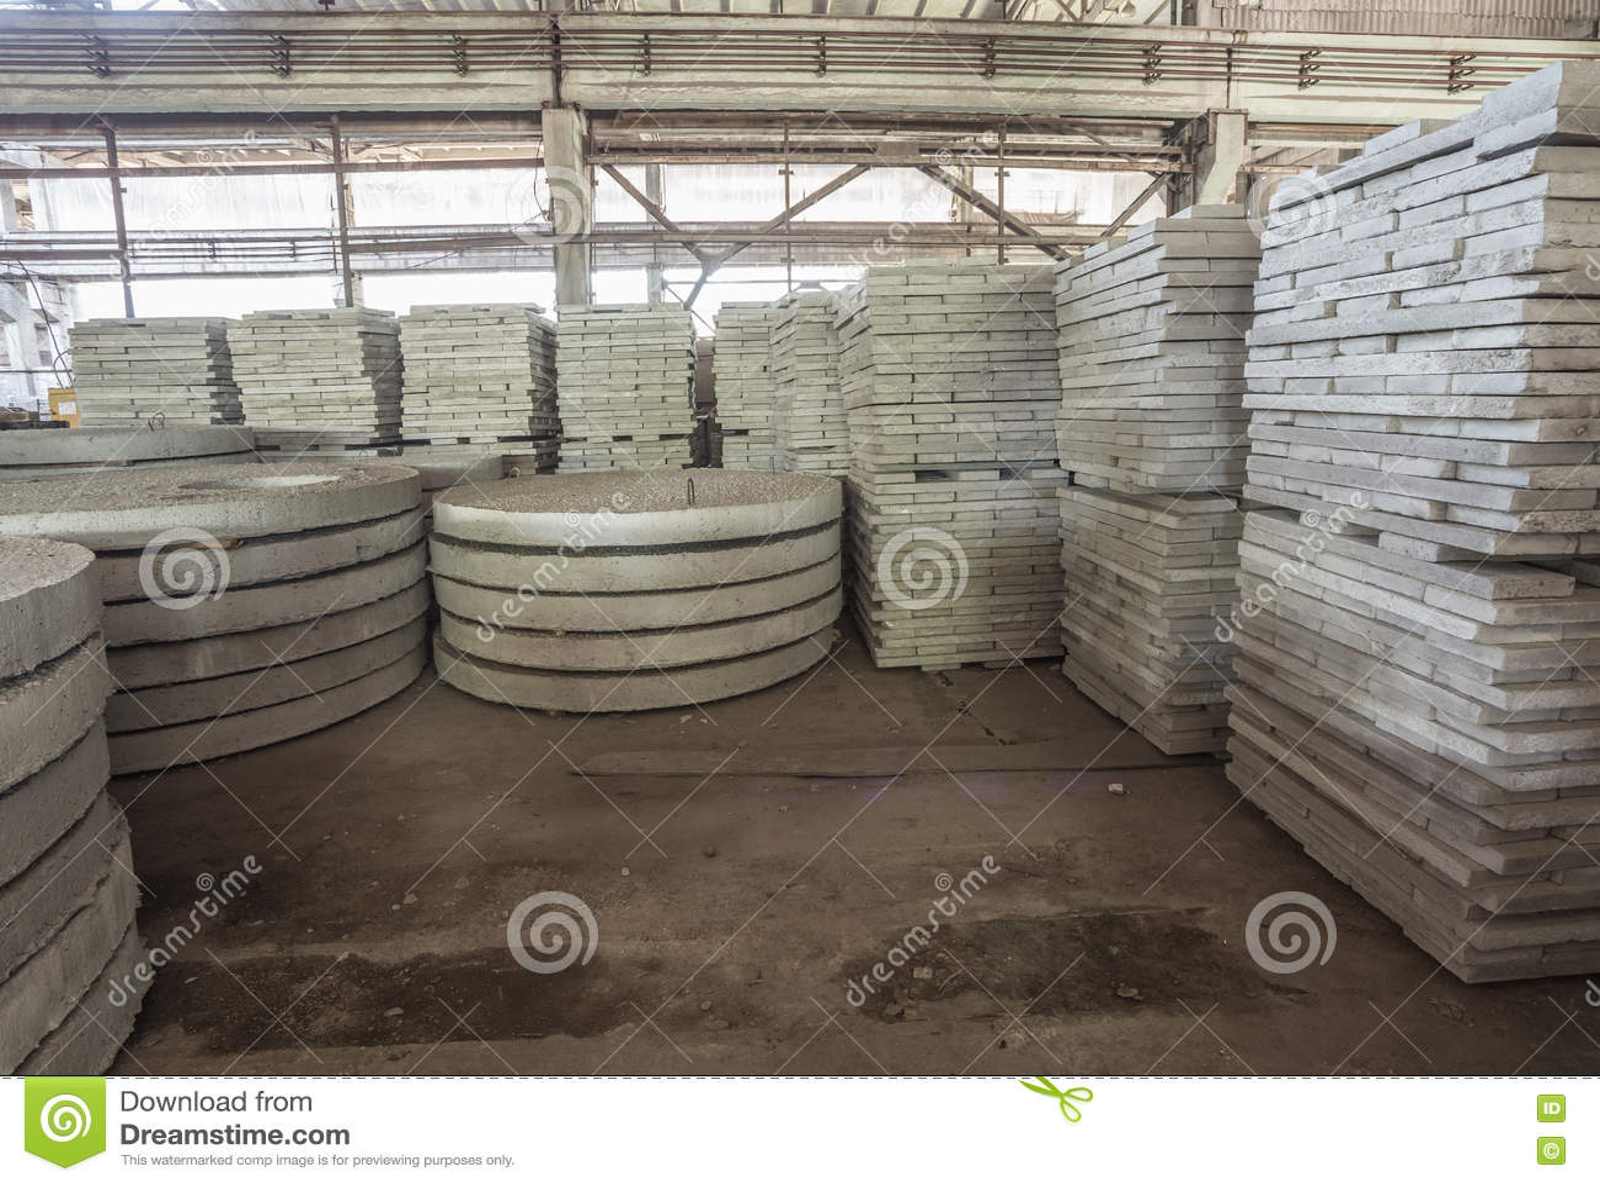 Precast Rcc Slab : Stack of precast reinforced concrete slabs in a house